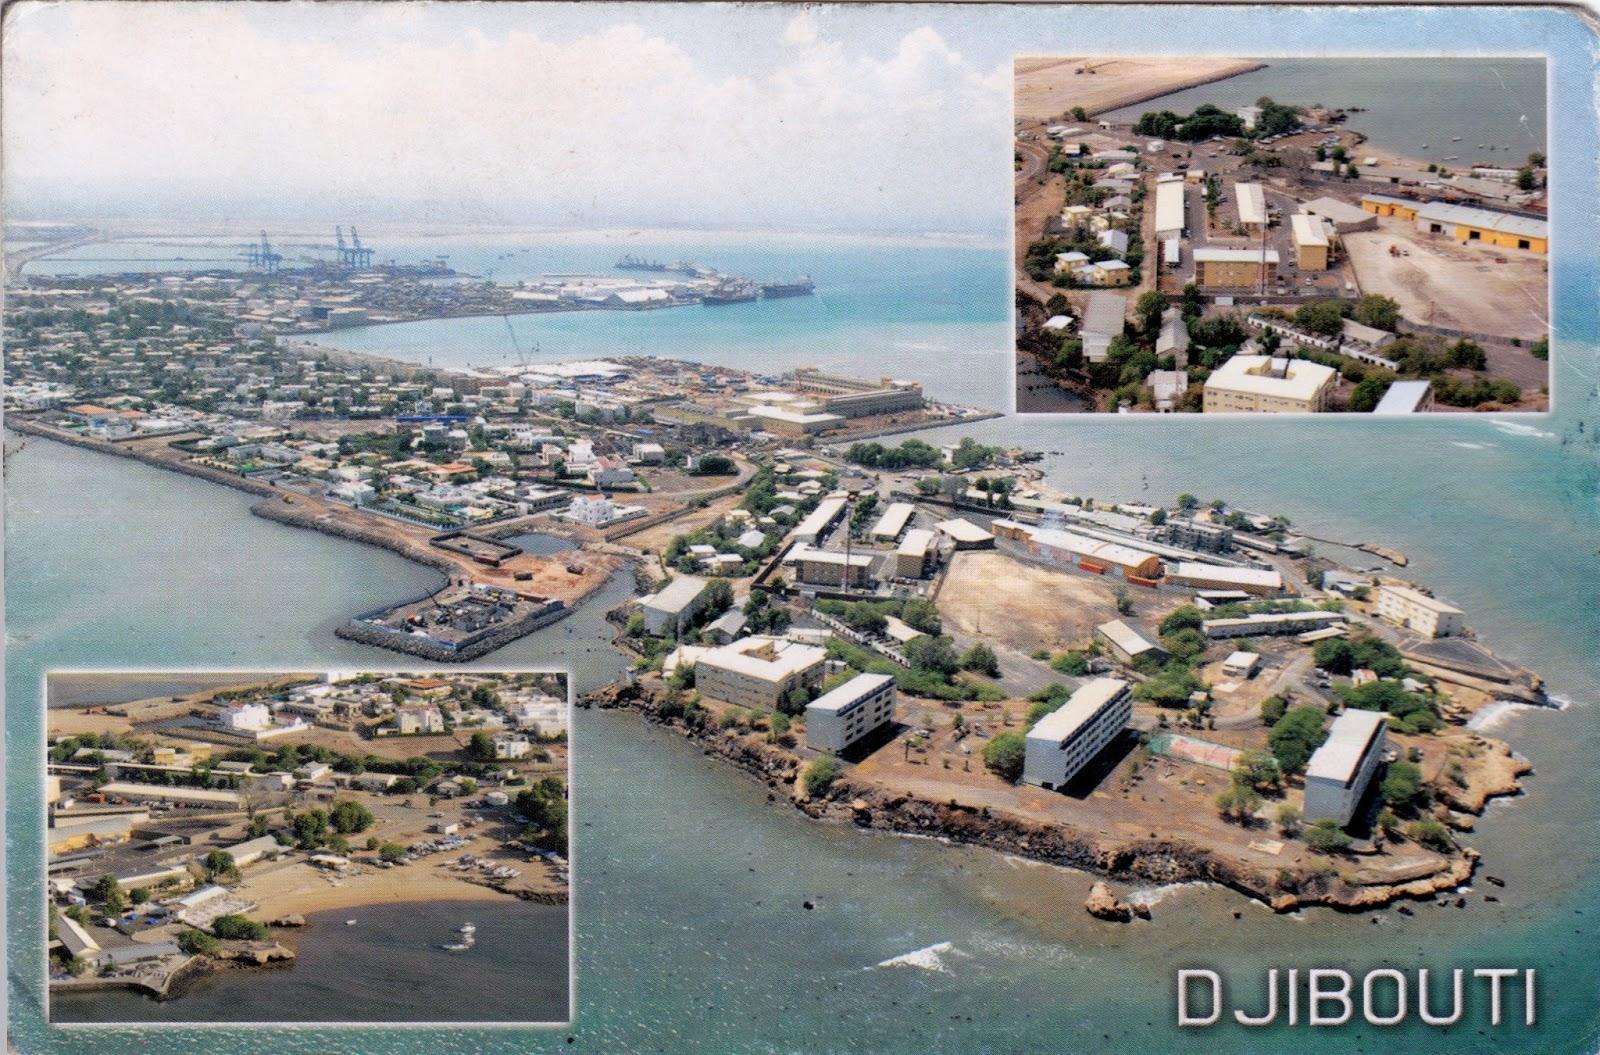 Pošalji mi razglednicu, neću SMS, po azbuci - Page 6 Djibouti+postcard+carte+postale+djibouti++%D8%AC%D9%8A%D8%A8%D9%88%D8%AA%D9%8A%E2%80%8E